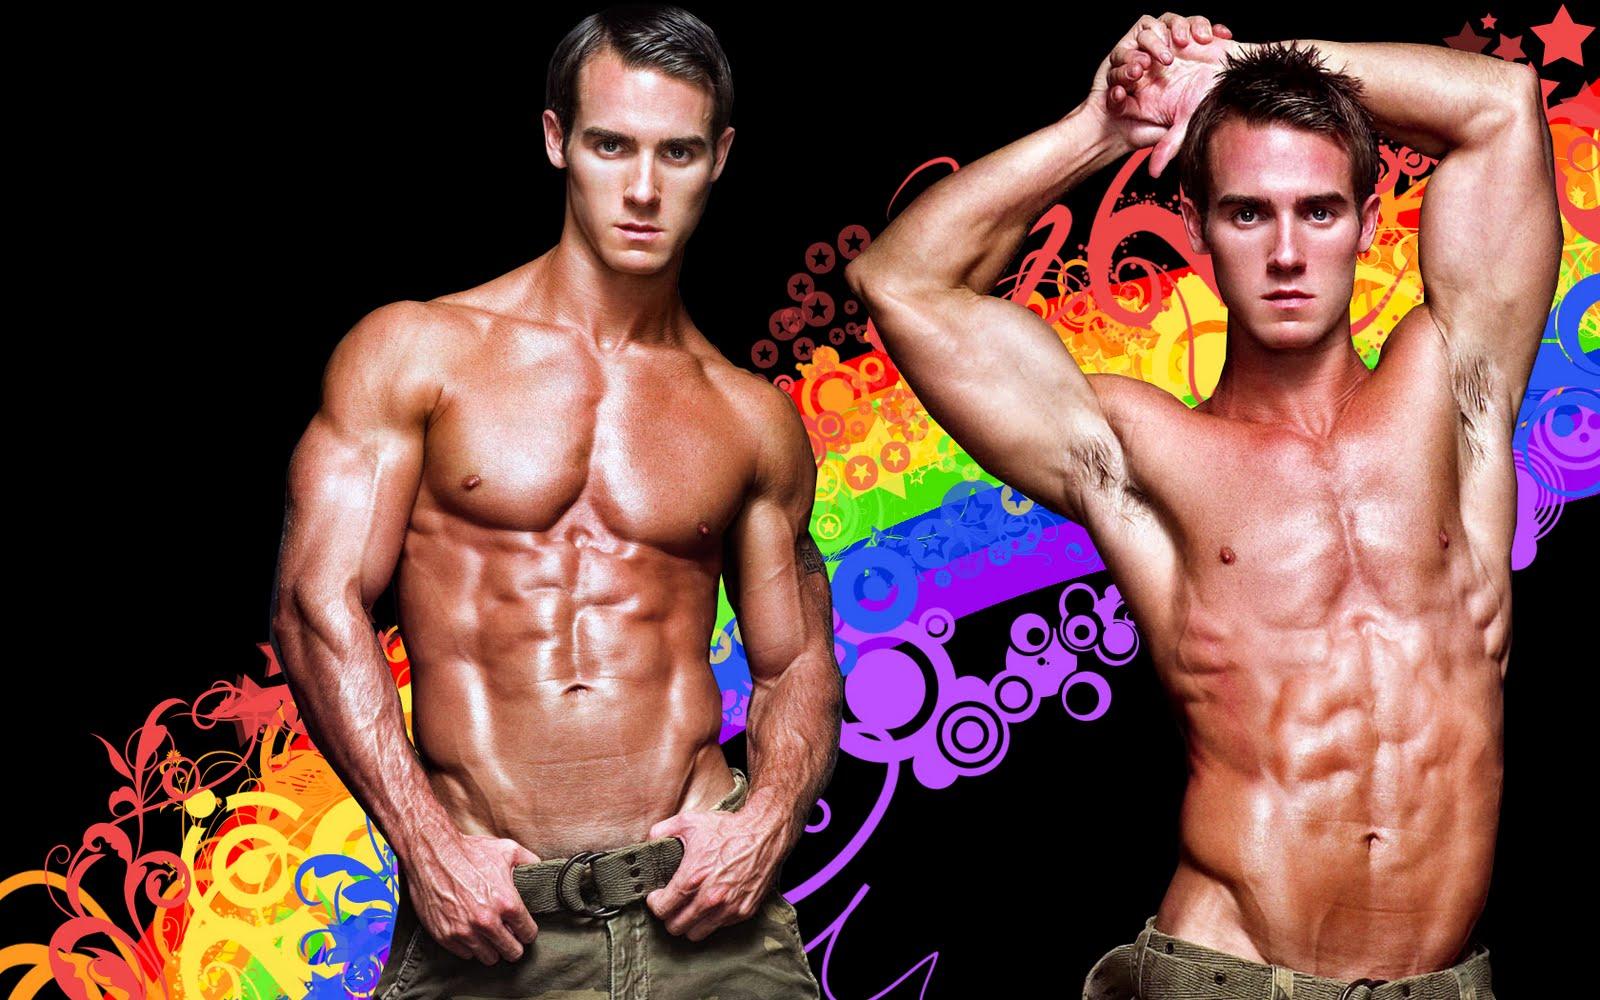 men gay thomas man male guys boys chest abdomen muscular bryan troy philips ...